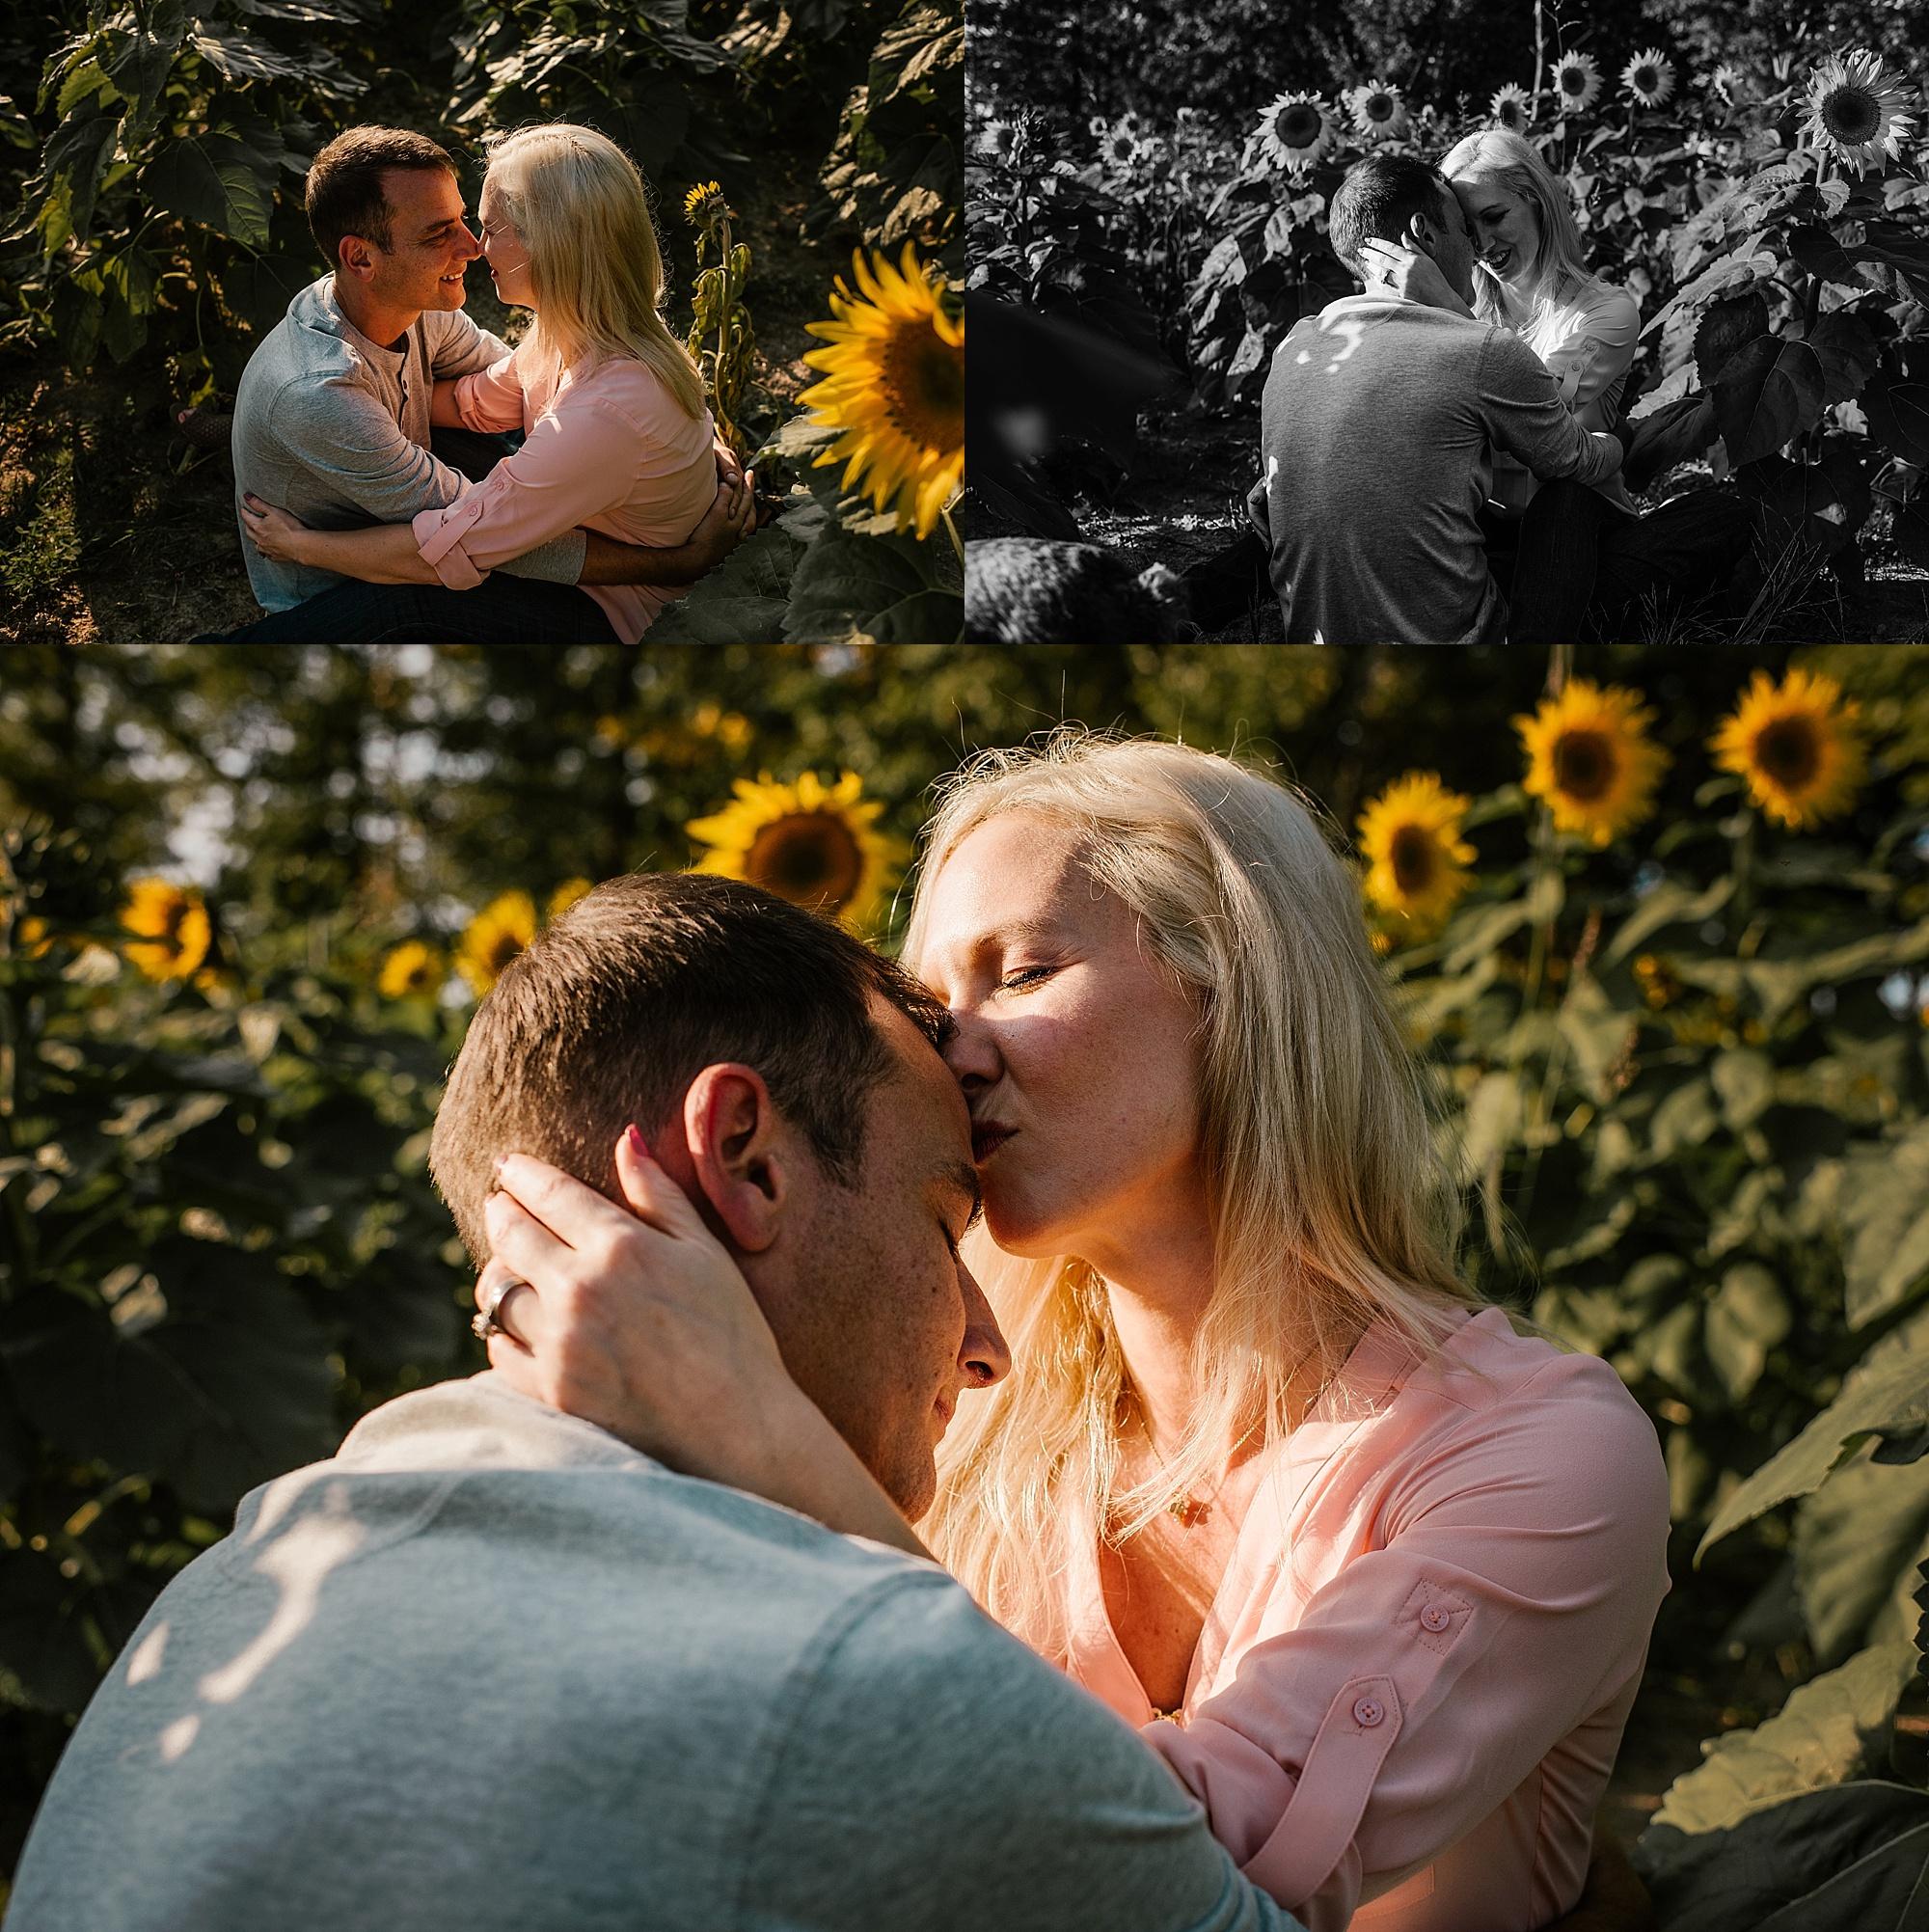 Lori-and-mike-akron-ohio-photographer-lauren-grayson-sunflower-field-session_0016.jpg